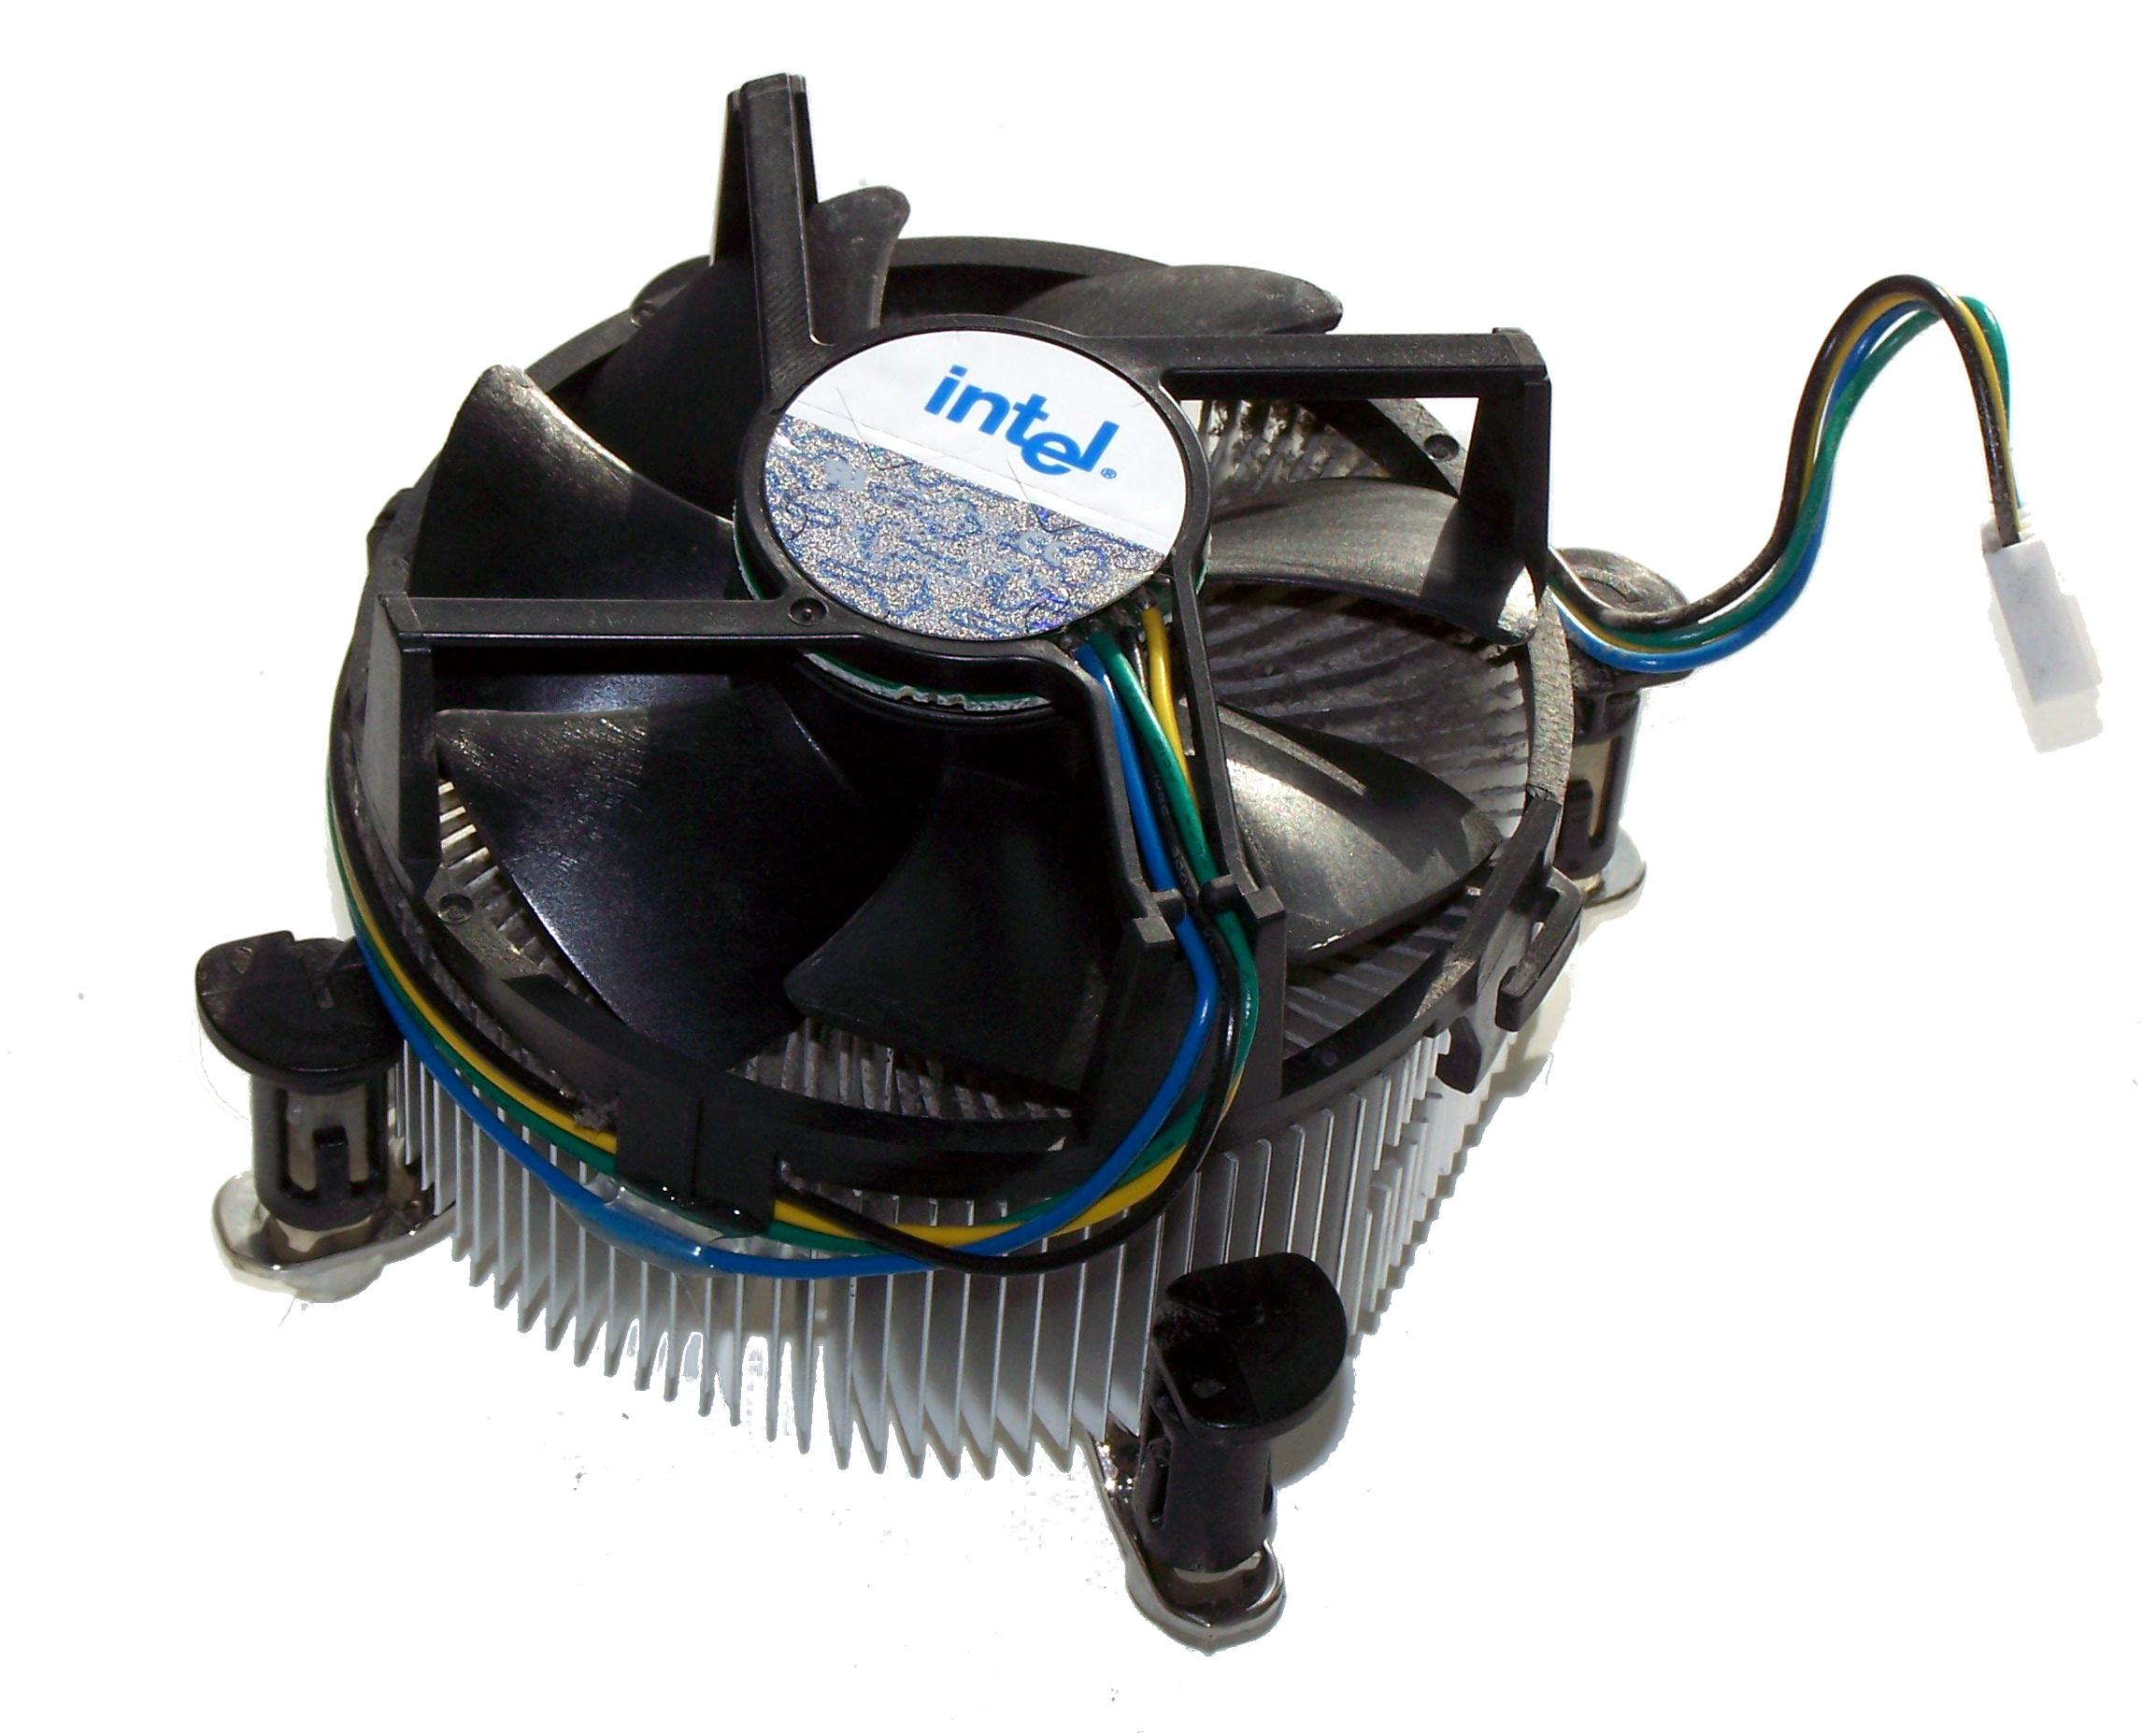 Intel D34223-001 Socket 775 Aluminum Heat Sink & 3